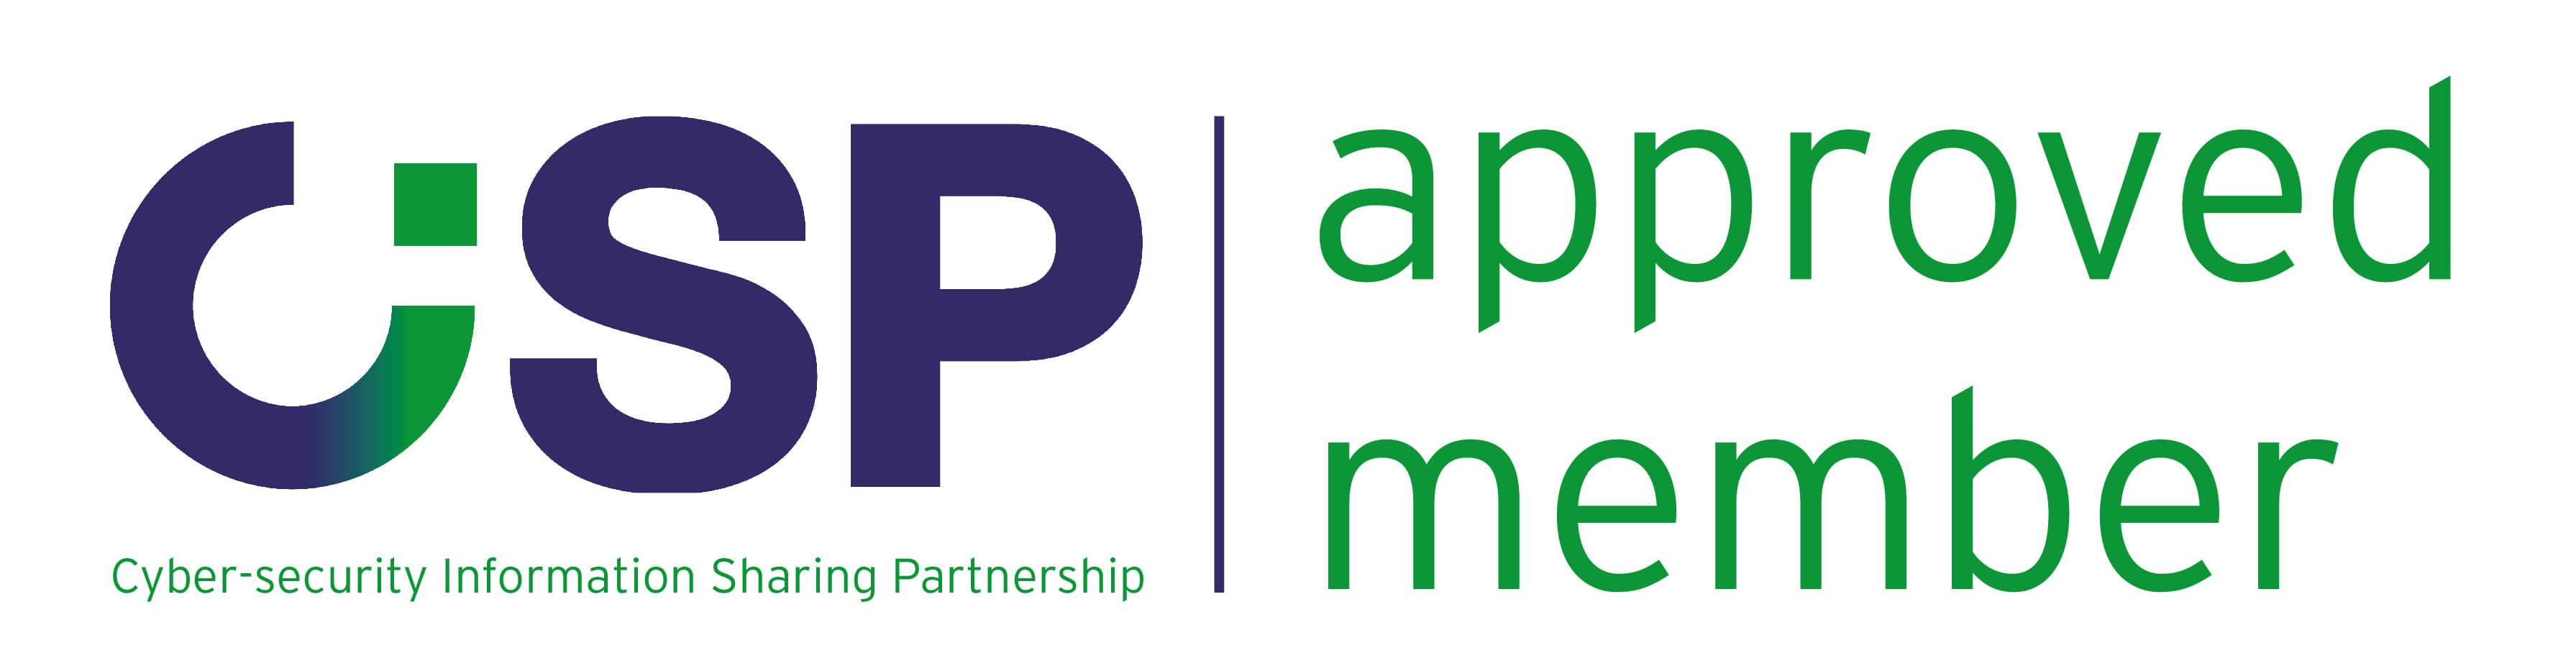 CiSP approved member